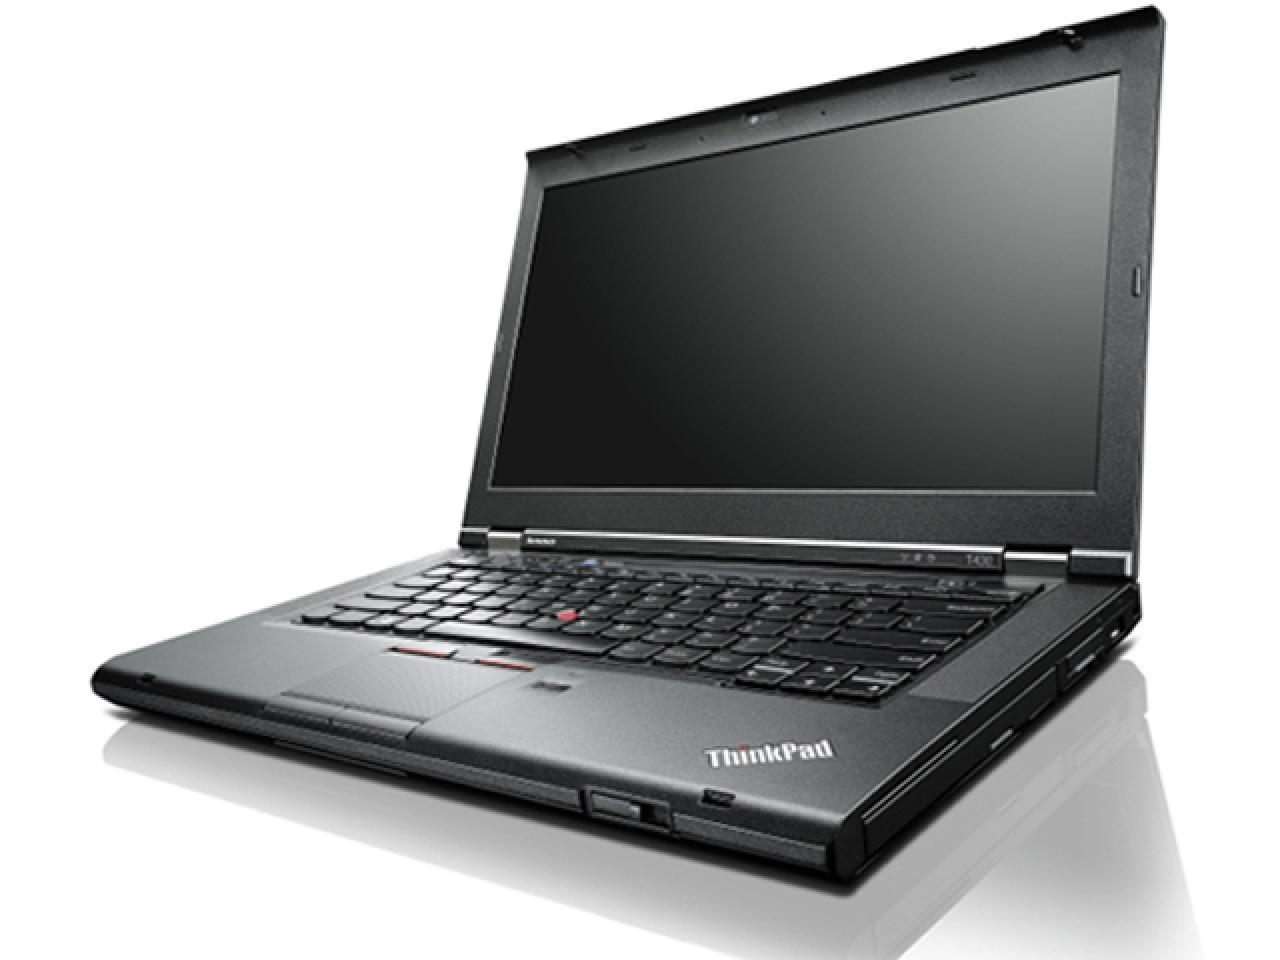 Lenovo ThinkPad T430  - shop.bb-net.de